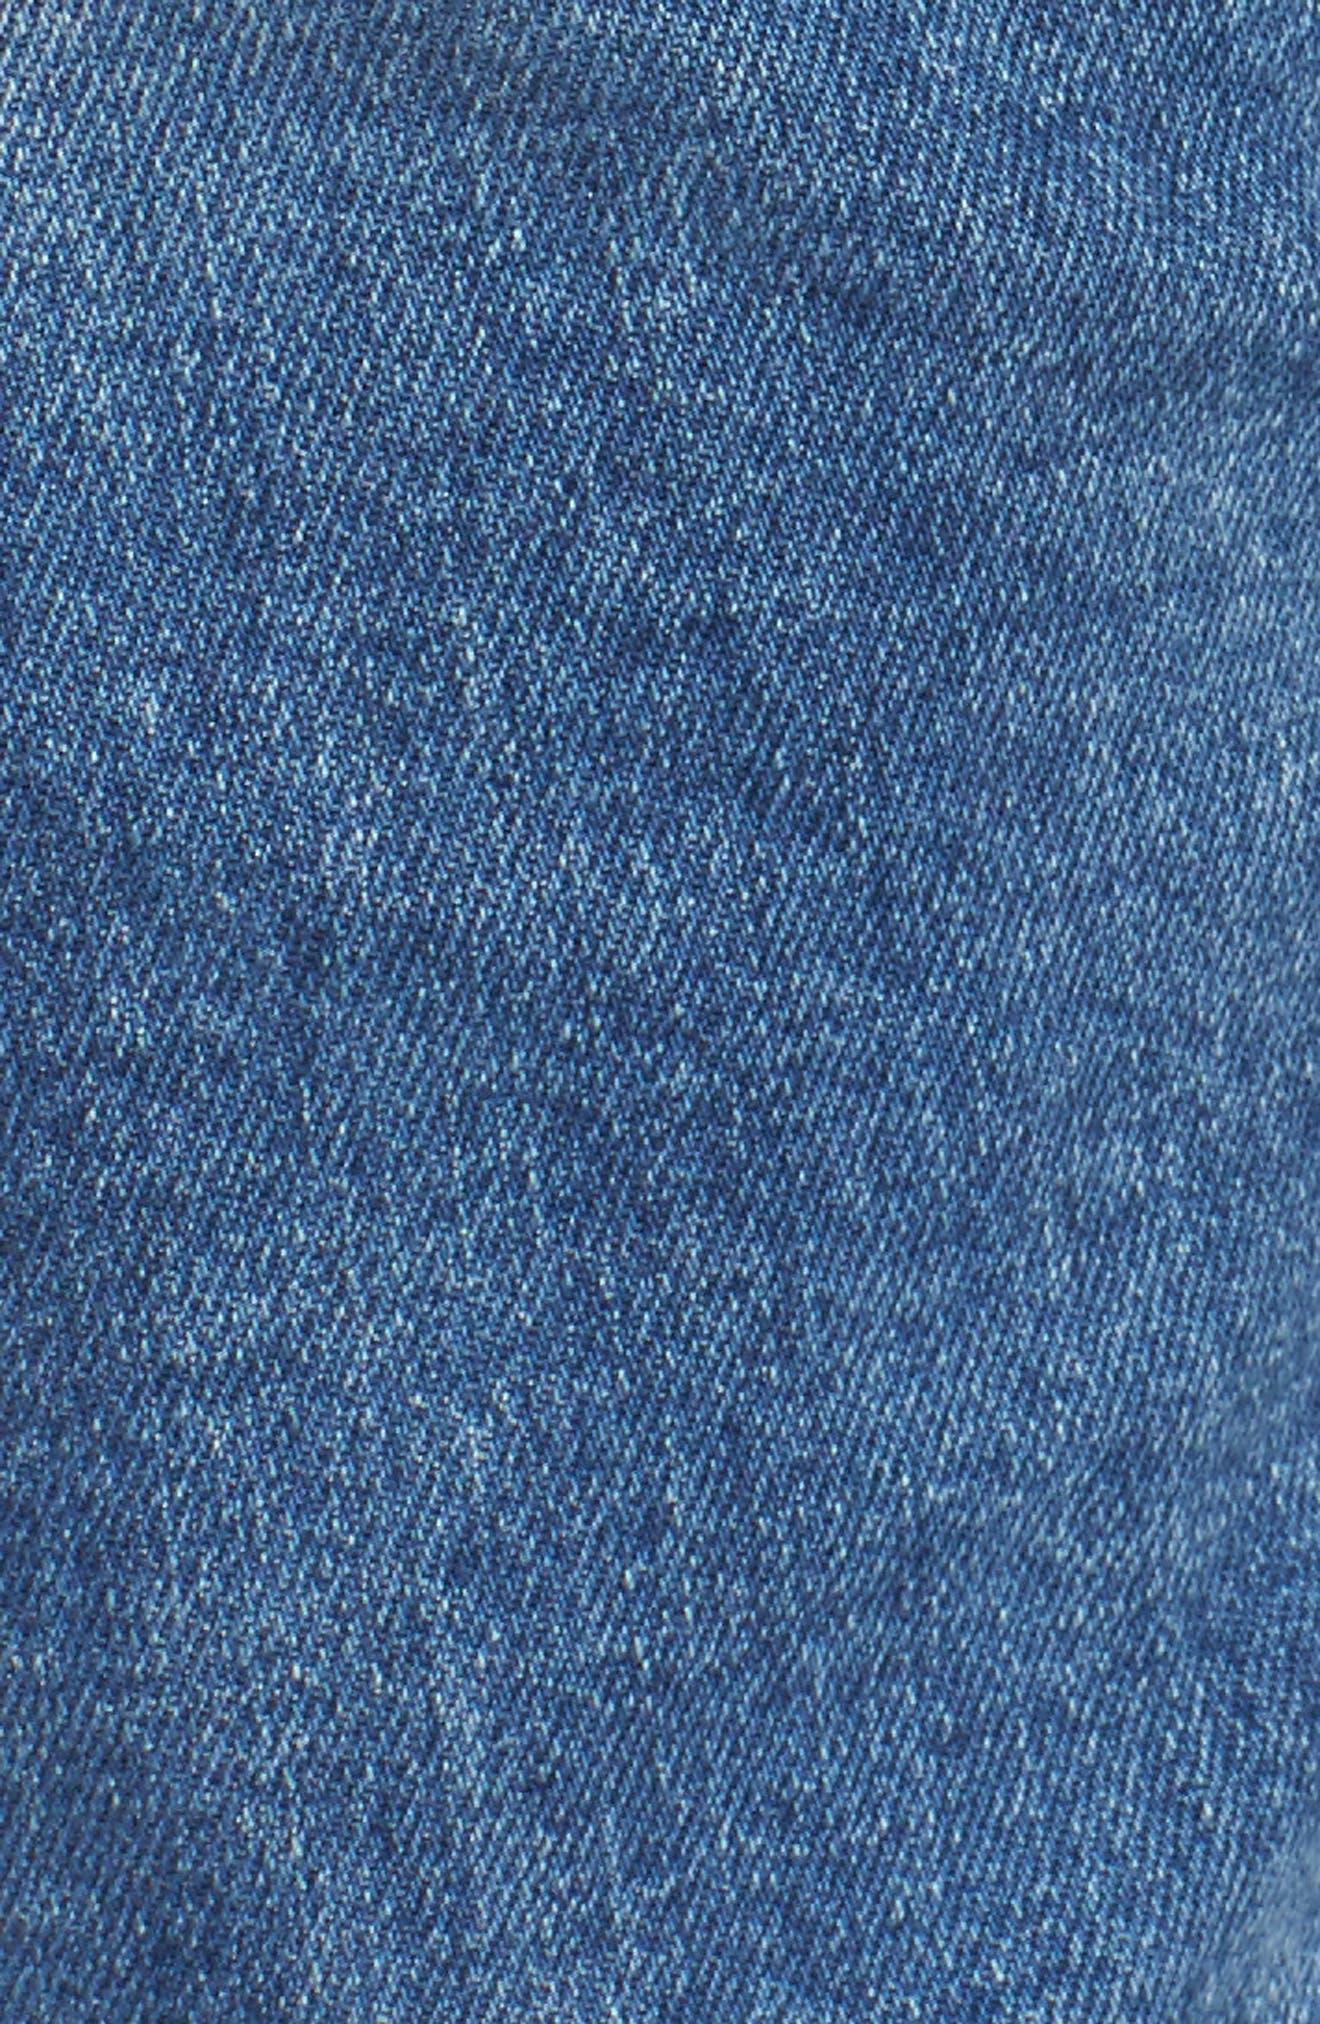 x Gigi Hadid Speed Distressed Ankle Zip Jeans,                             Alternate thumbnail 5, color,